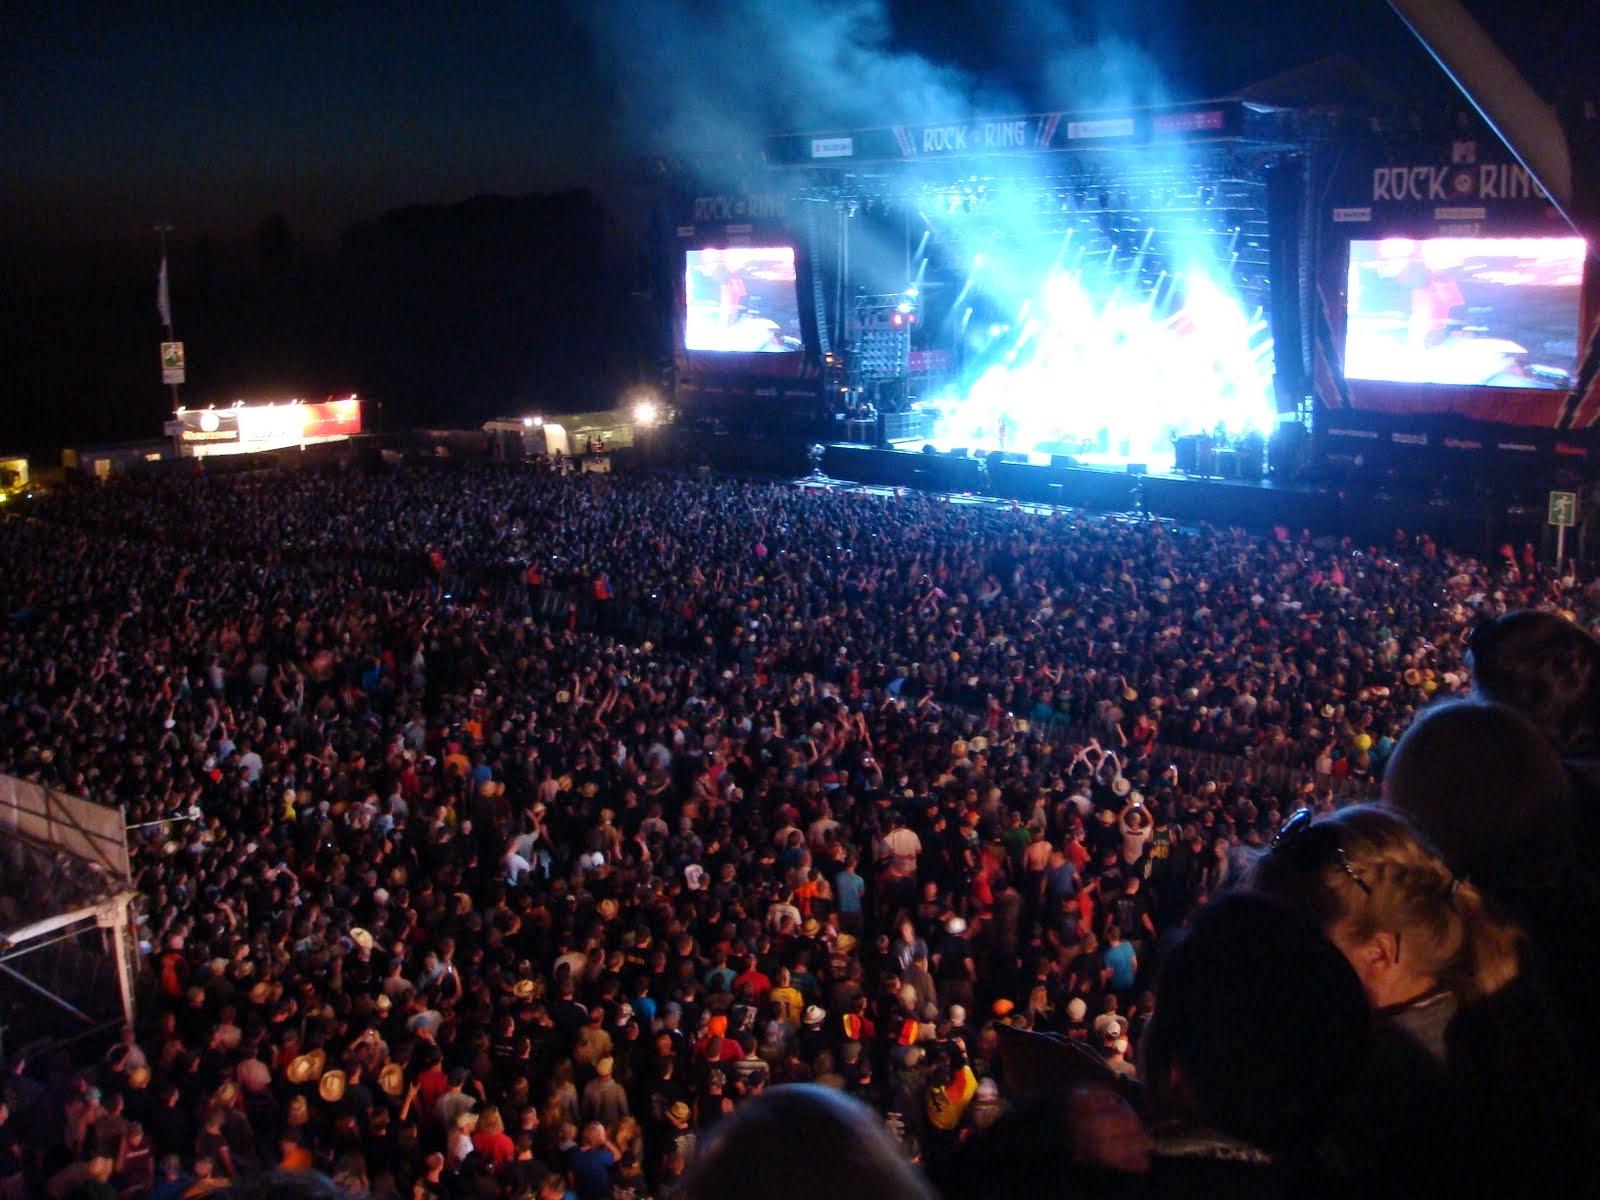 konser musik rock terbesar segelas info